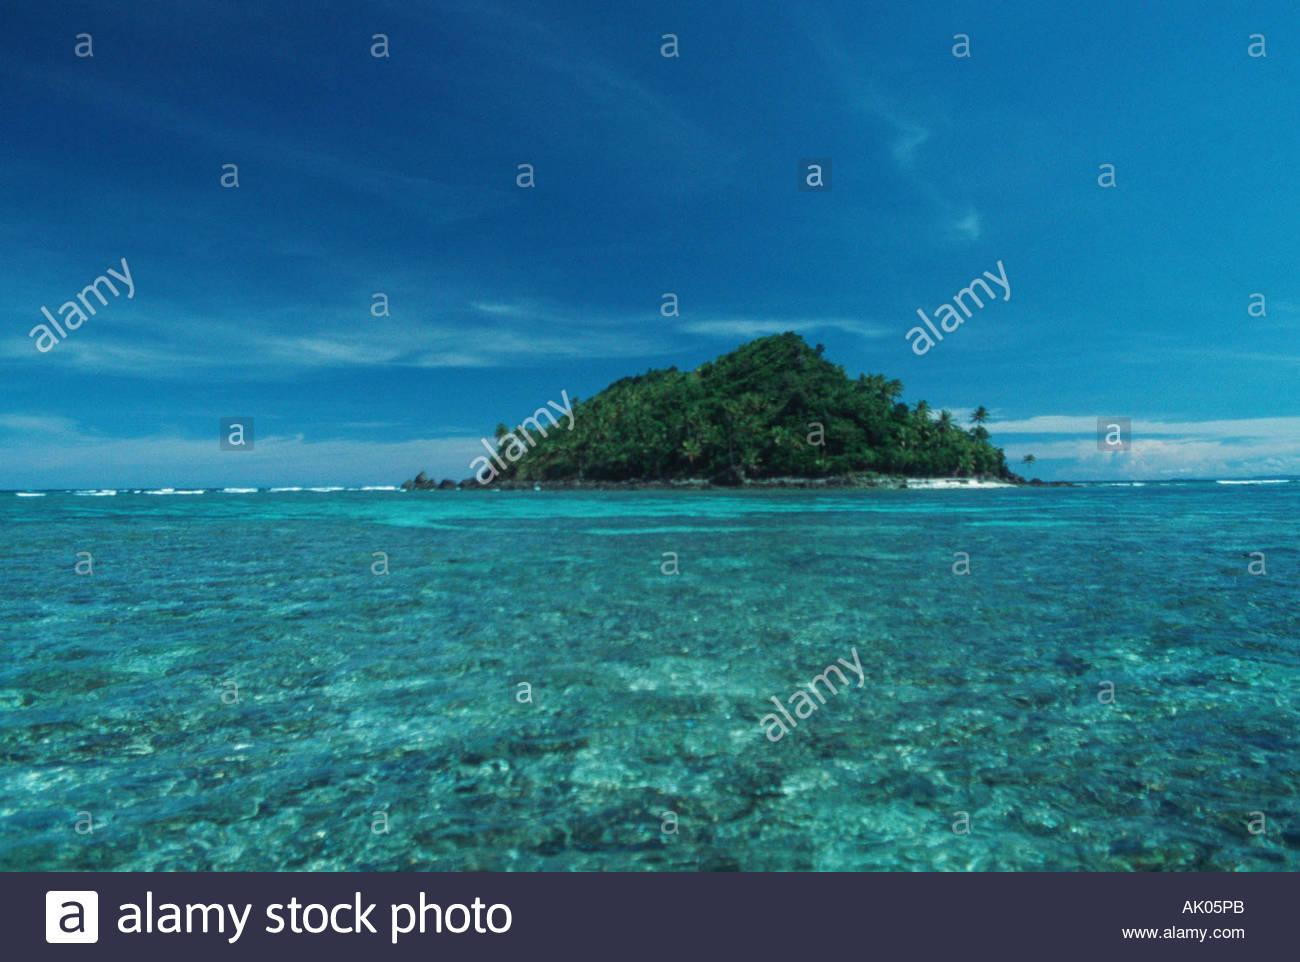 Mabuntok Island - Stock Image